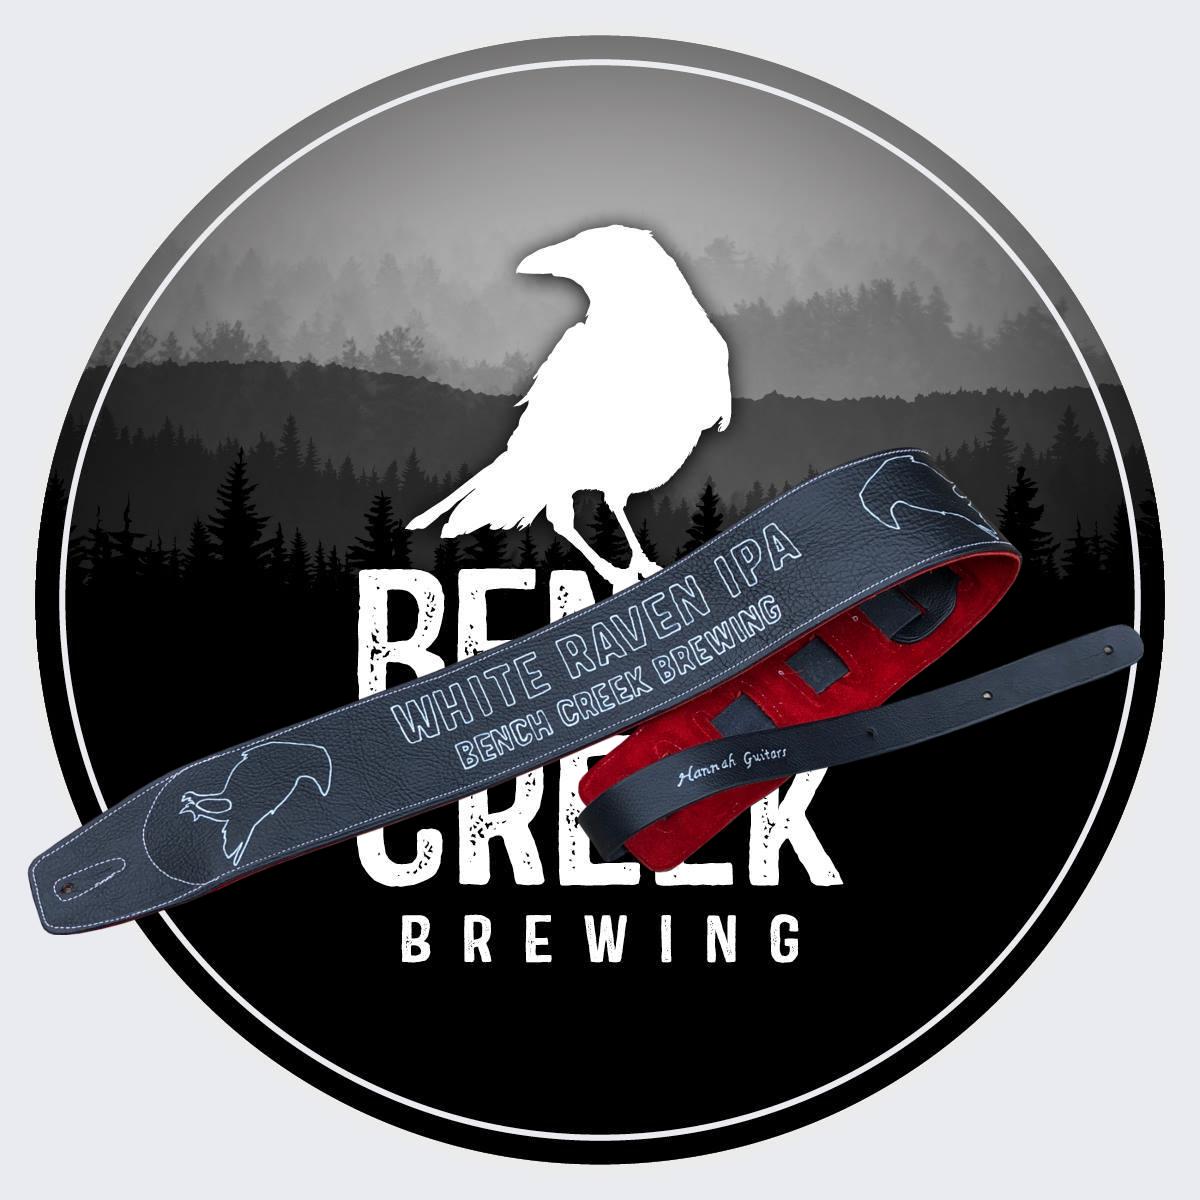 Bench Creek Logo and Strap3